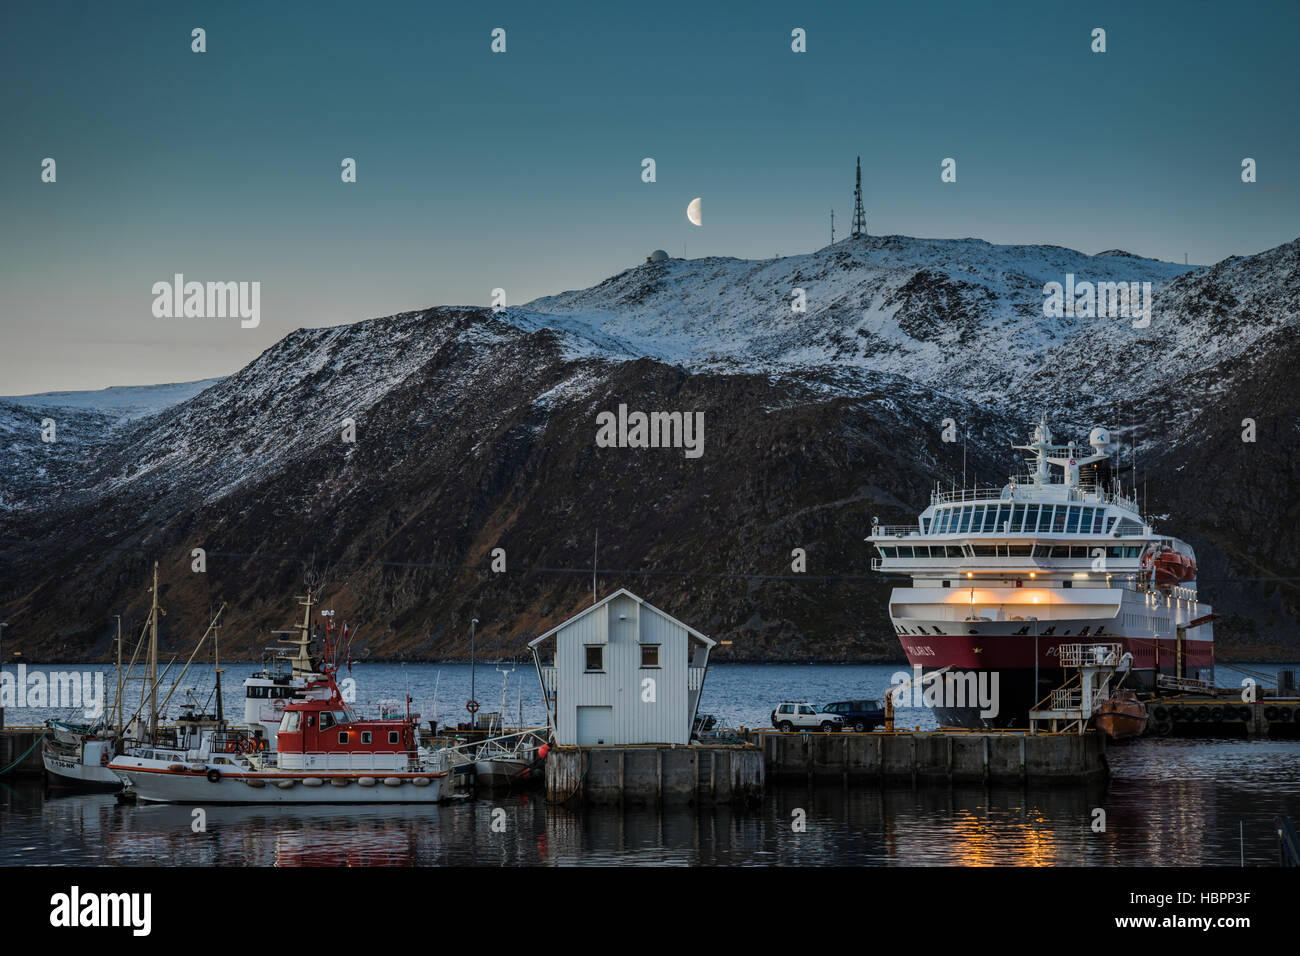 Hurtigruten MS Polarlys docked at Honningsvag, Northern Norway. - Stock Image